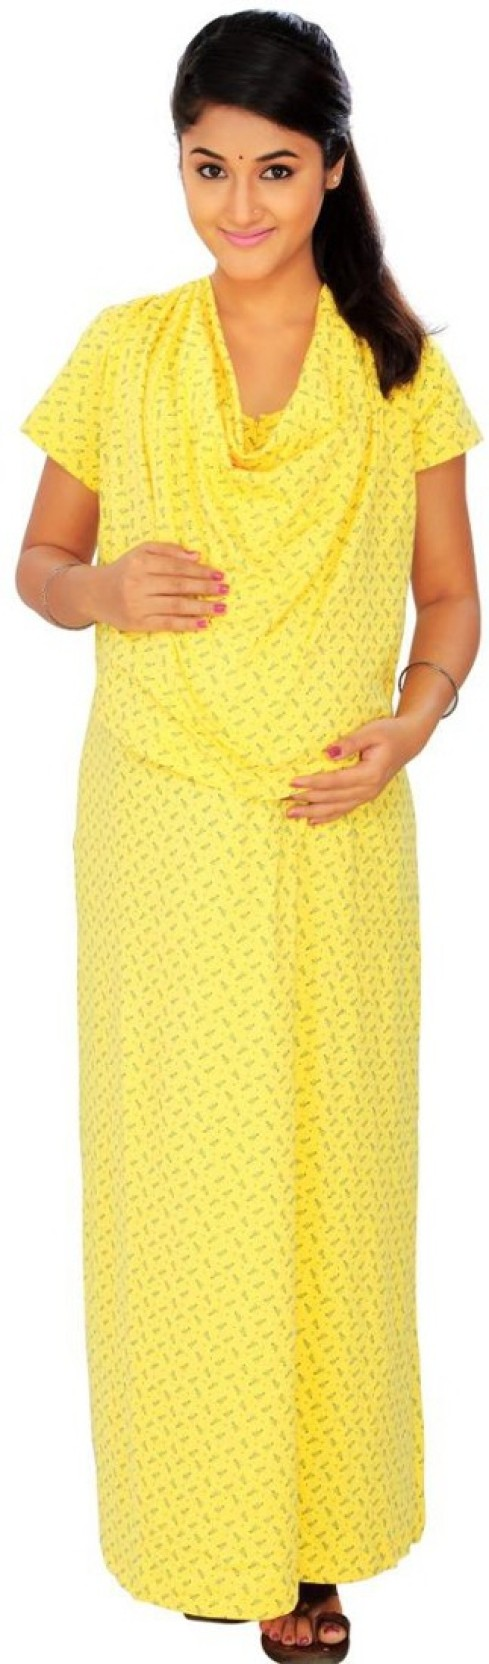 d4229ea72259b Kriti Comfort Women's Nighty - Buy Yellow Kriti Comfort Women's ...